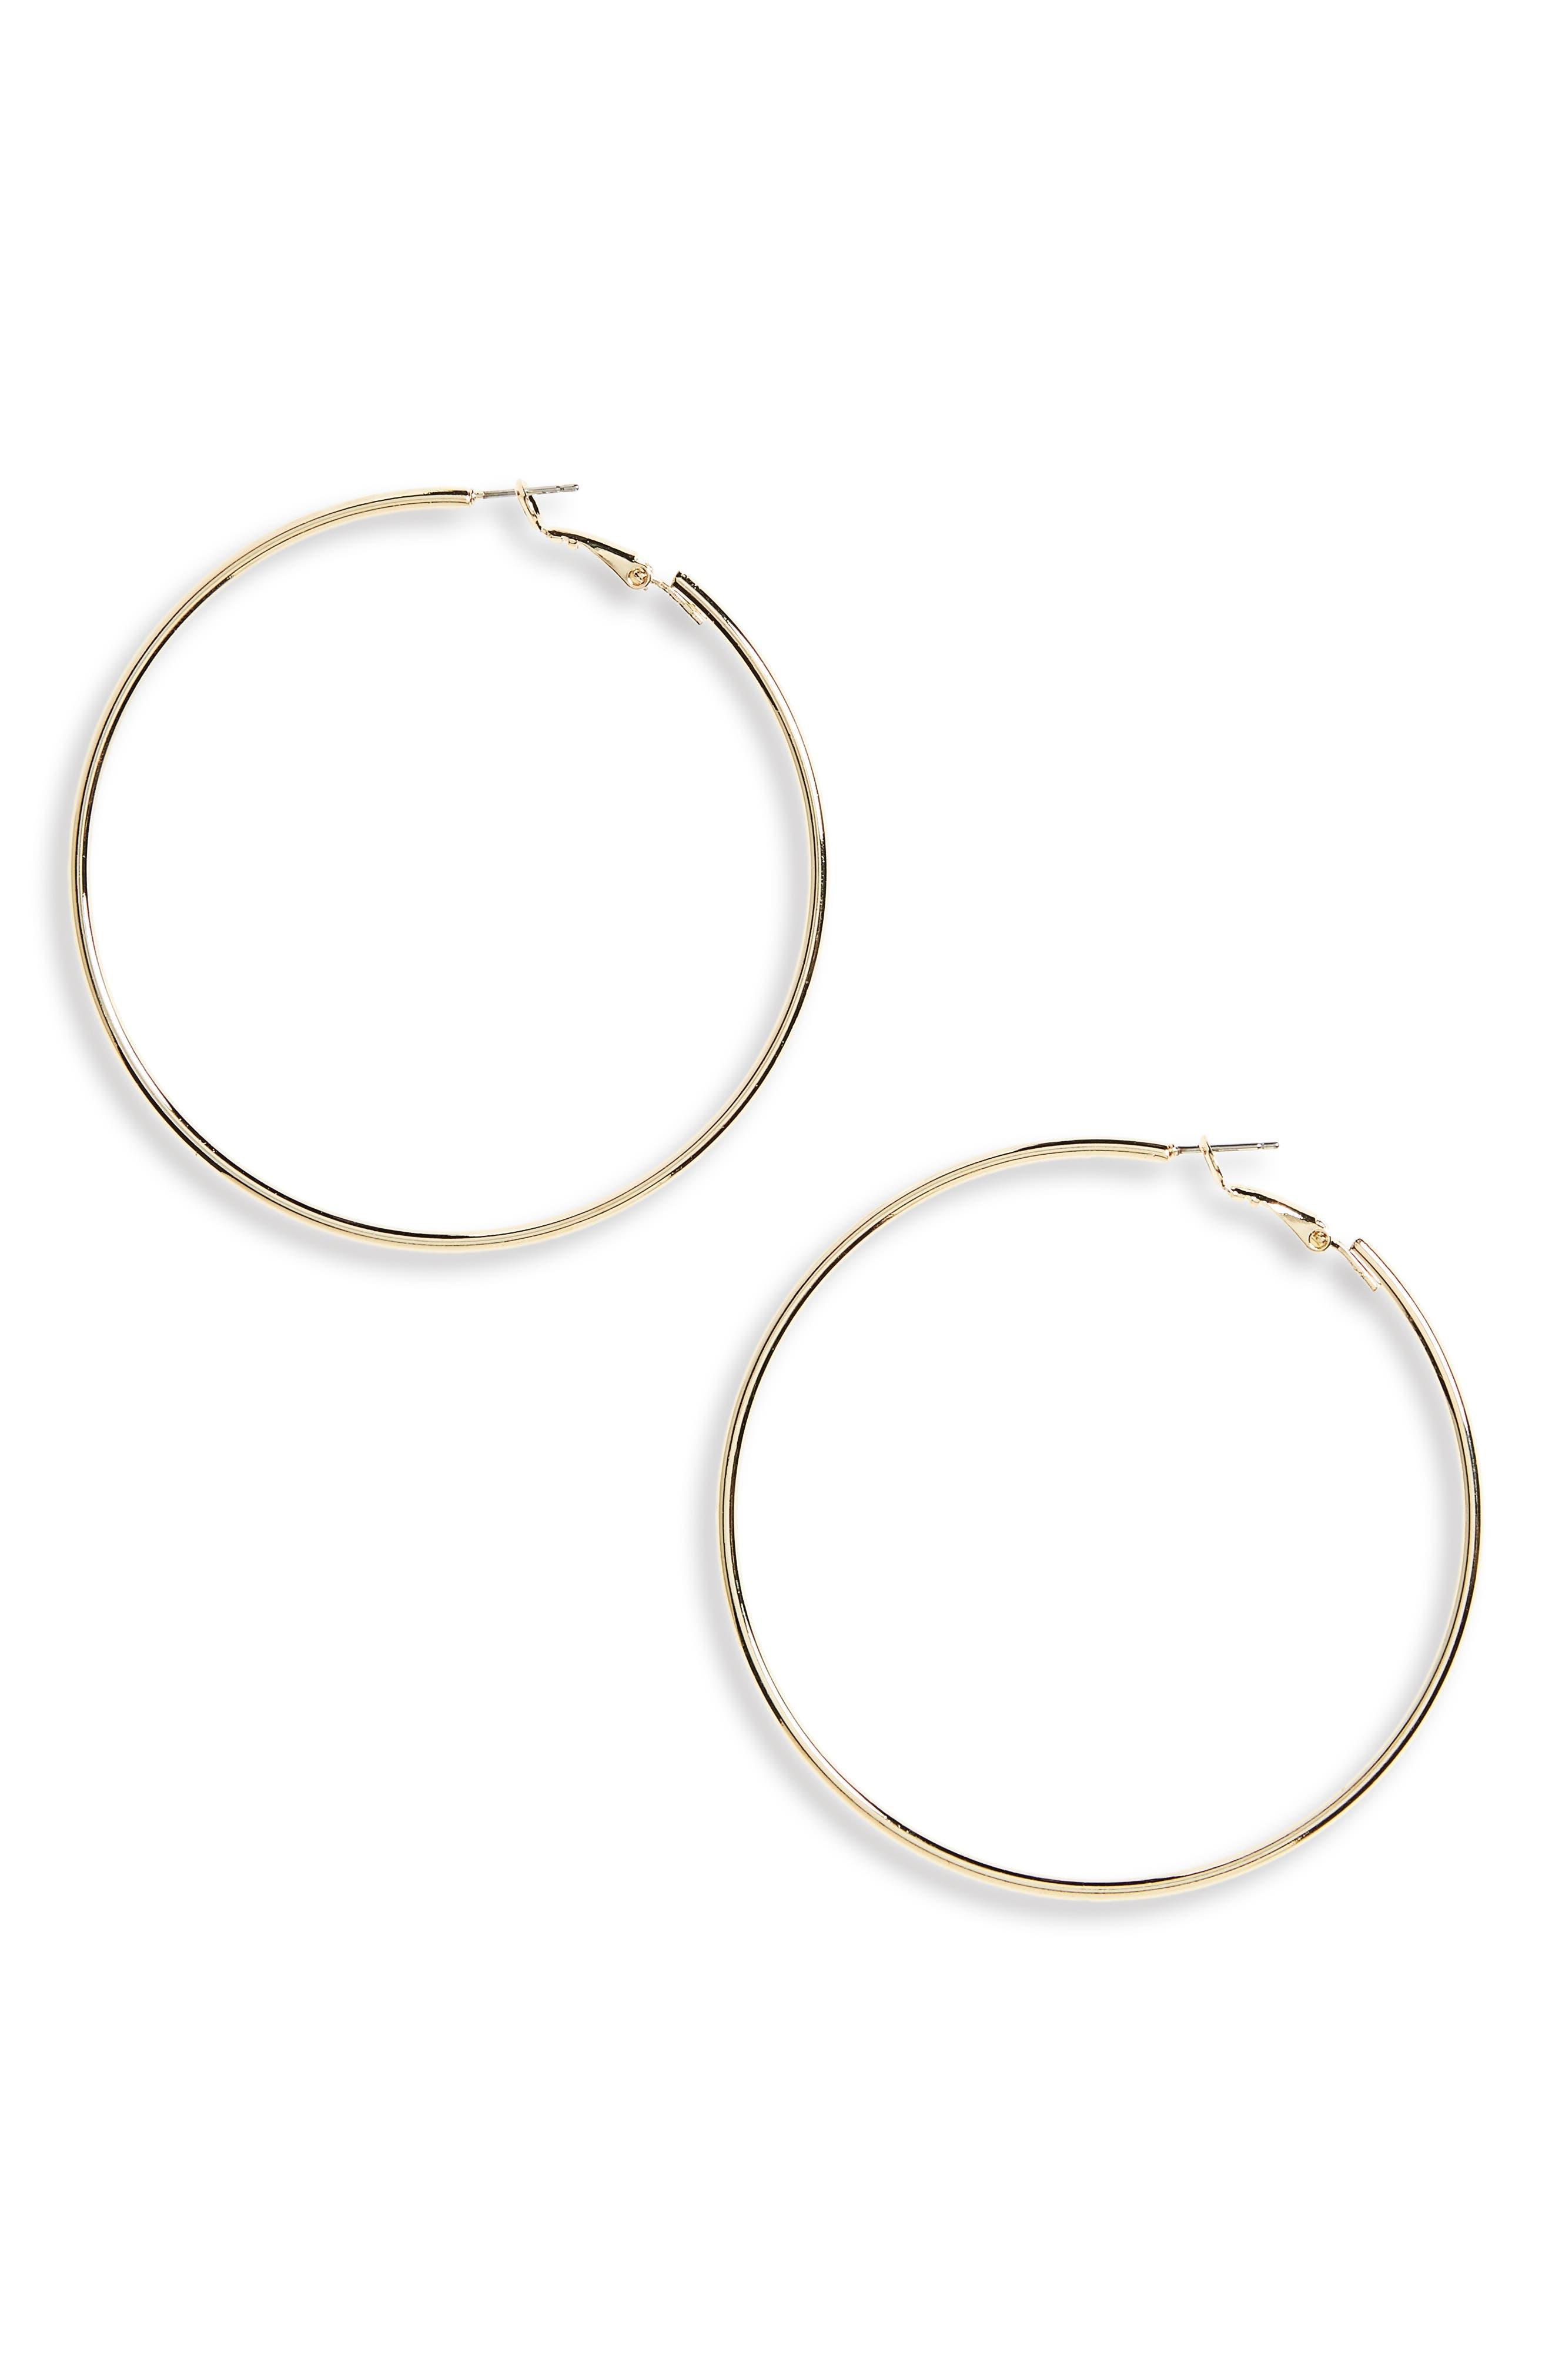 Gold Hoop Earrings,                             Main thumbnail 1, color,                             GOLD